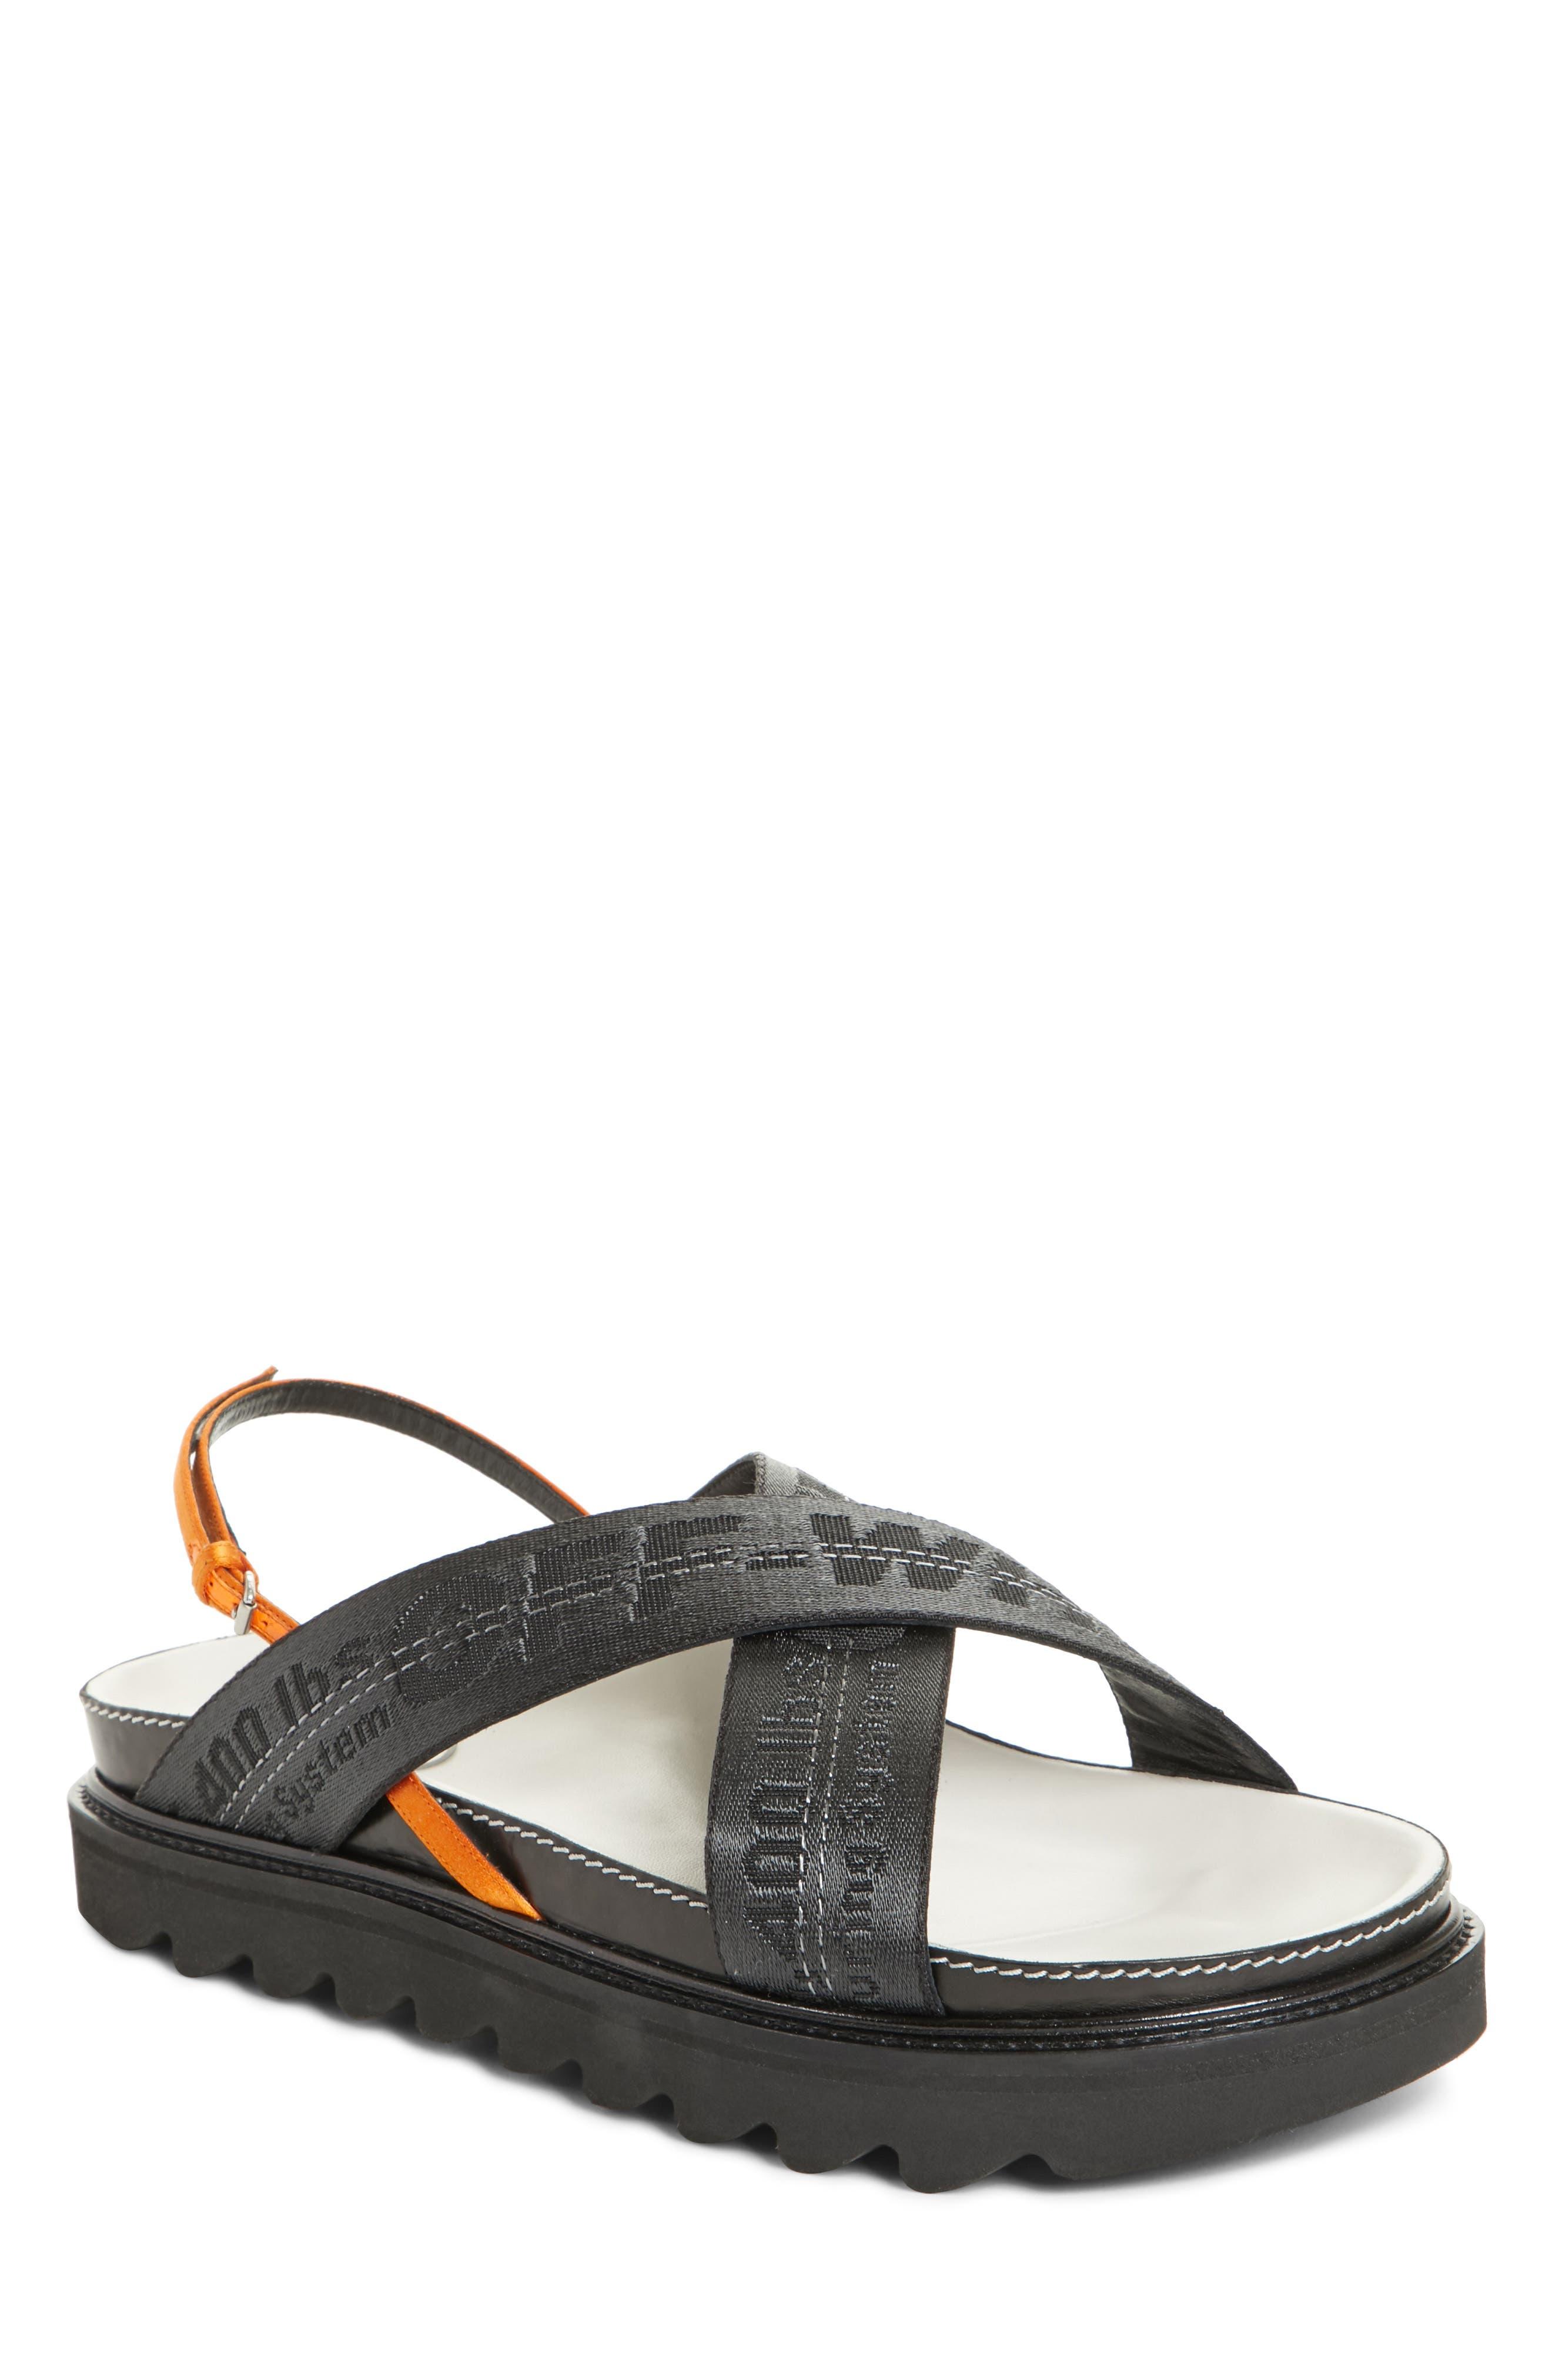 Industrial Belt Sandal,                             Main thumbnail 1, color,                             Black Black